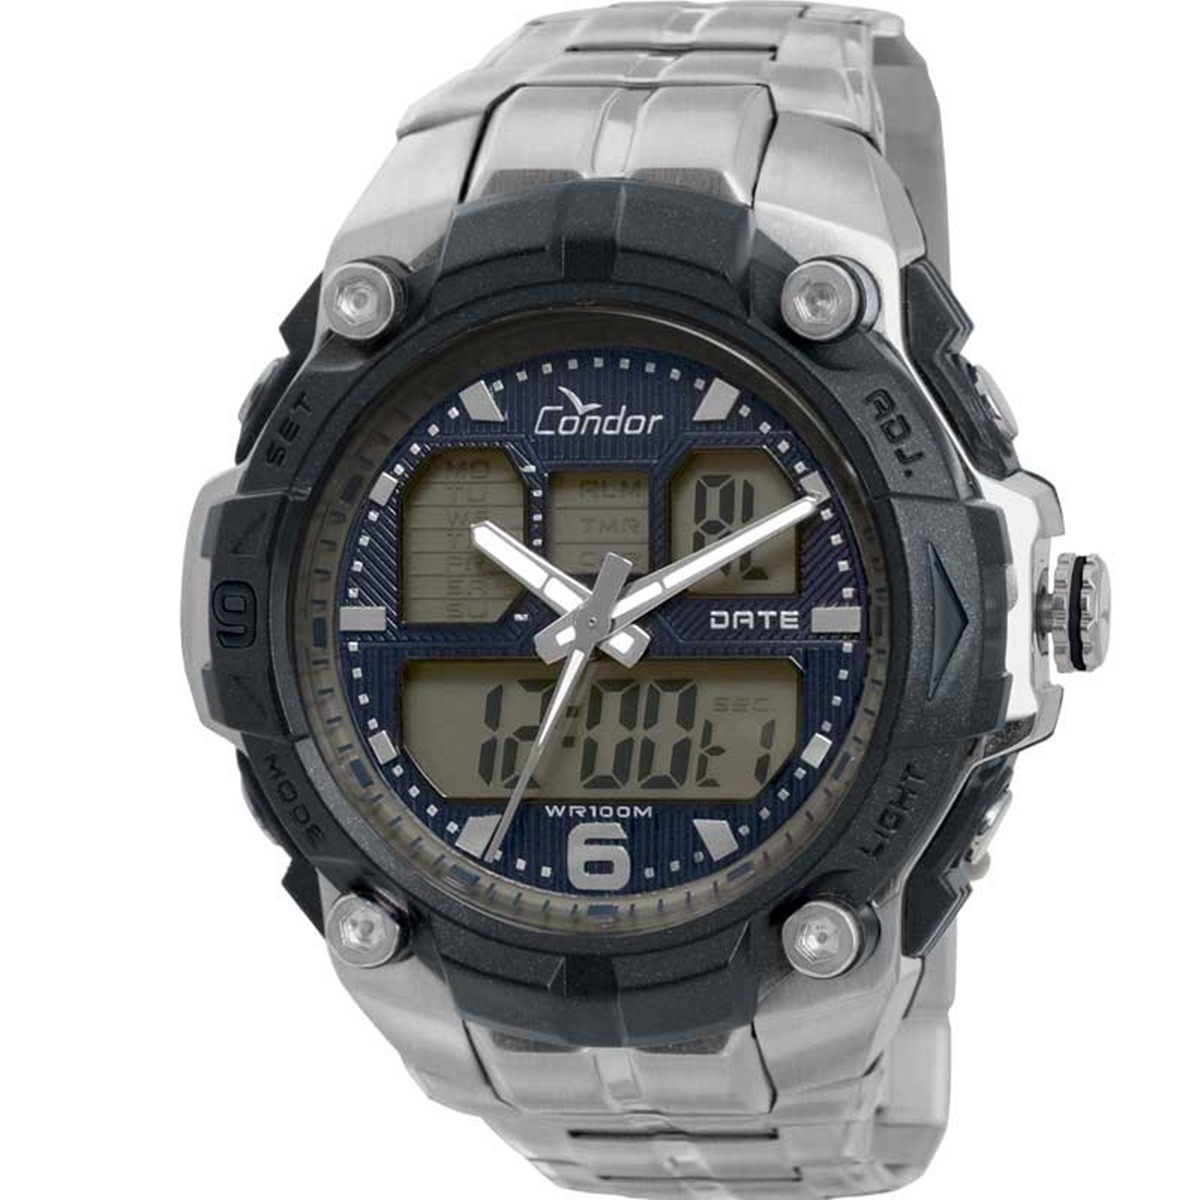 9c0b0b8b6ed relógio condor masculino prata anadigi esportivo coad0912 3p. Carregando  zoom.